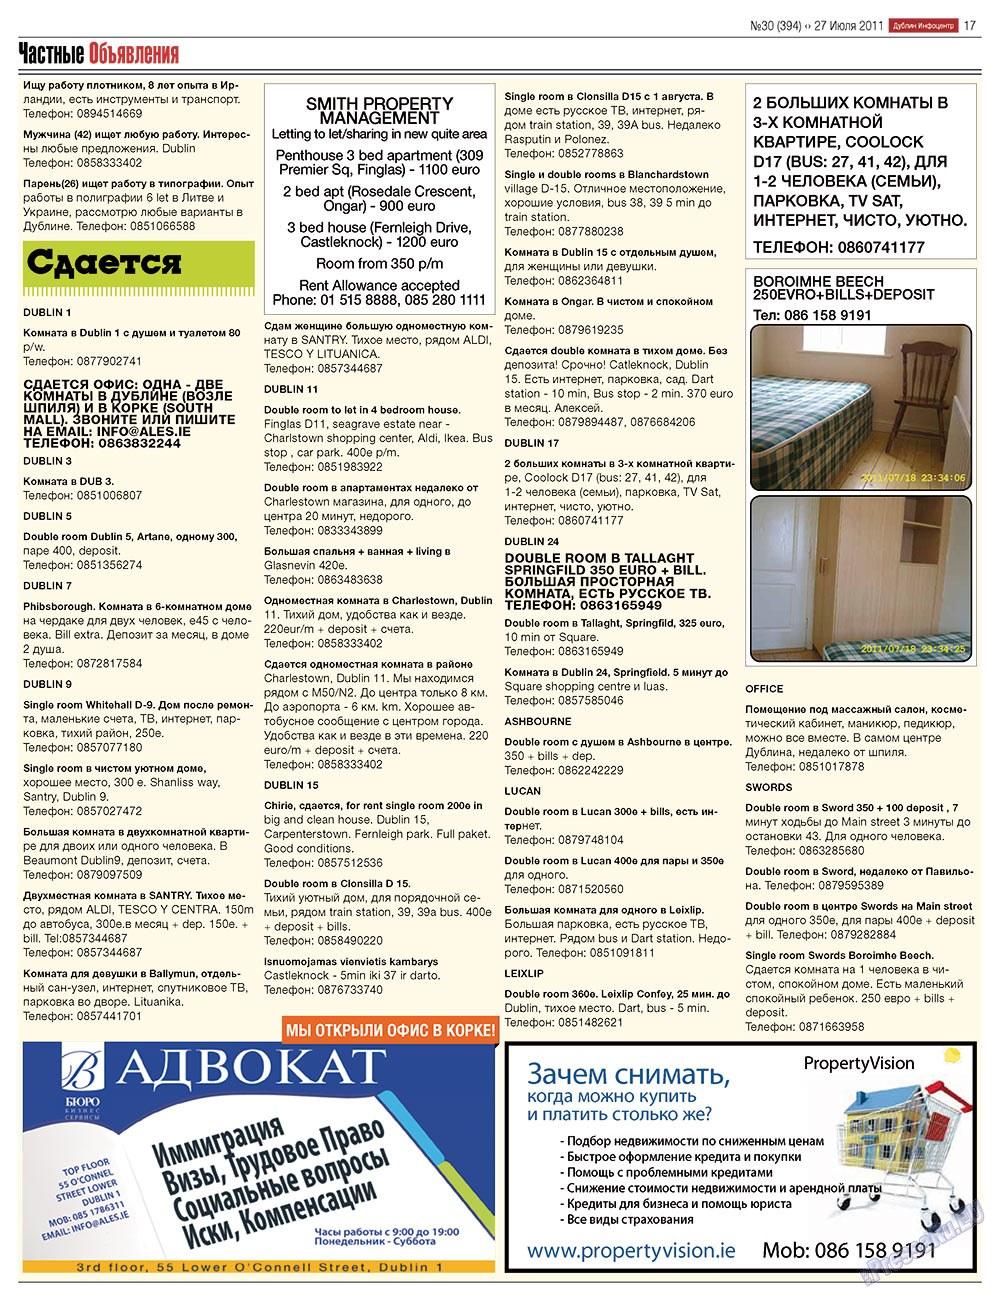 Дублин инфоцентр (газета). 2011 год, номер 30, стр. 17